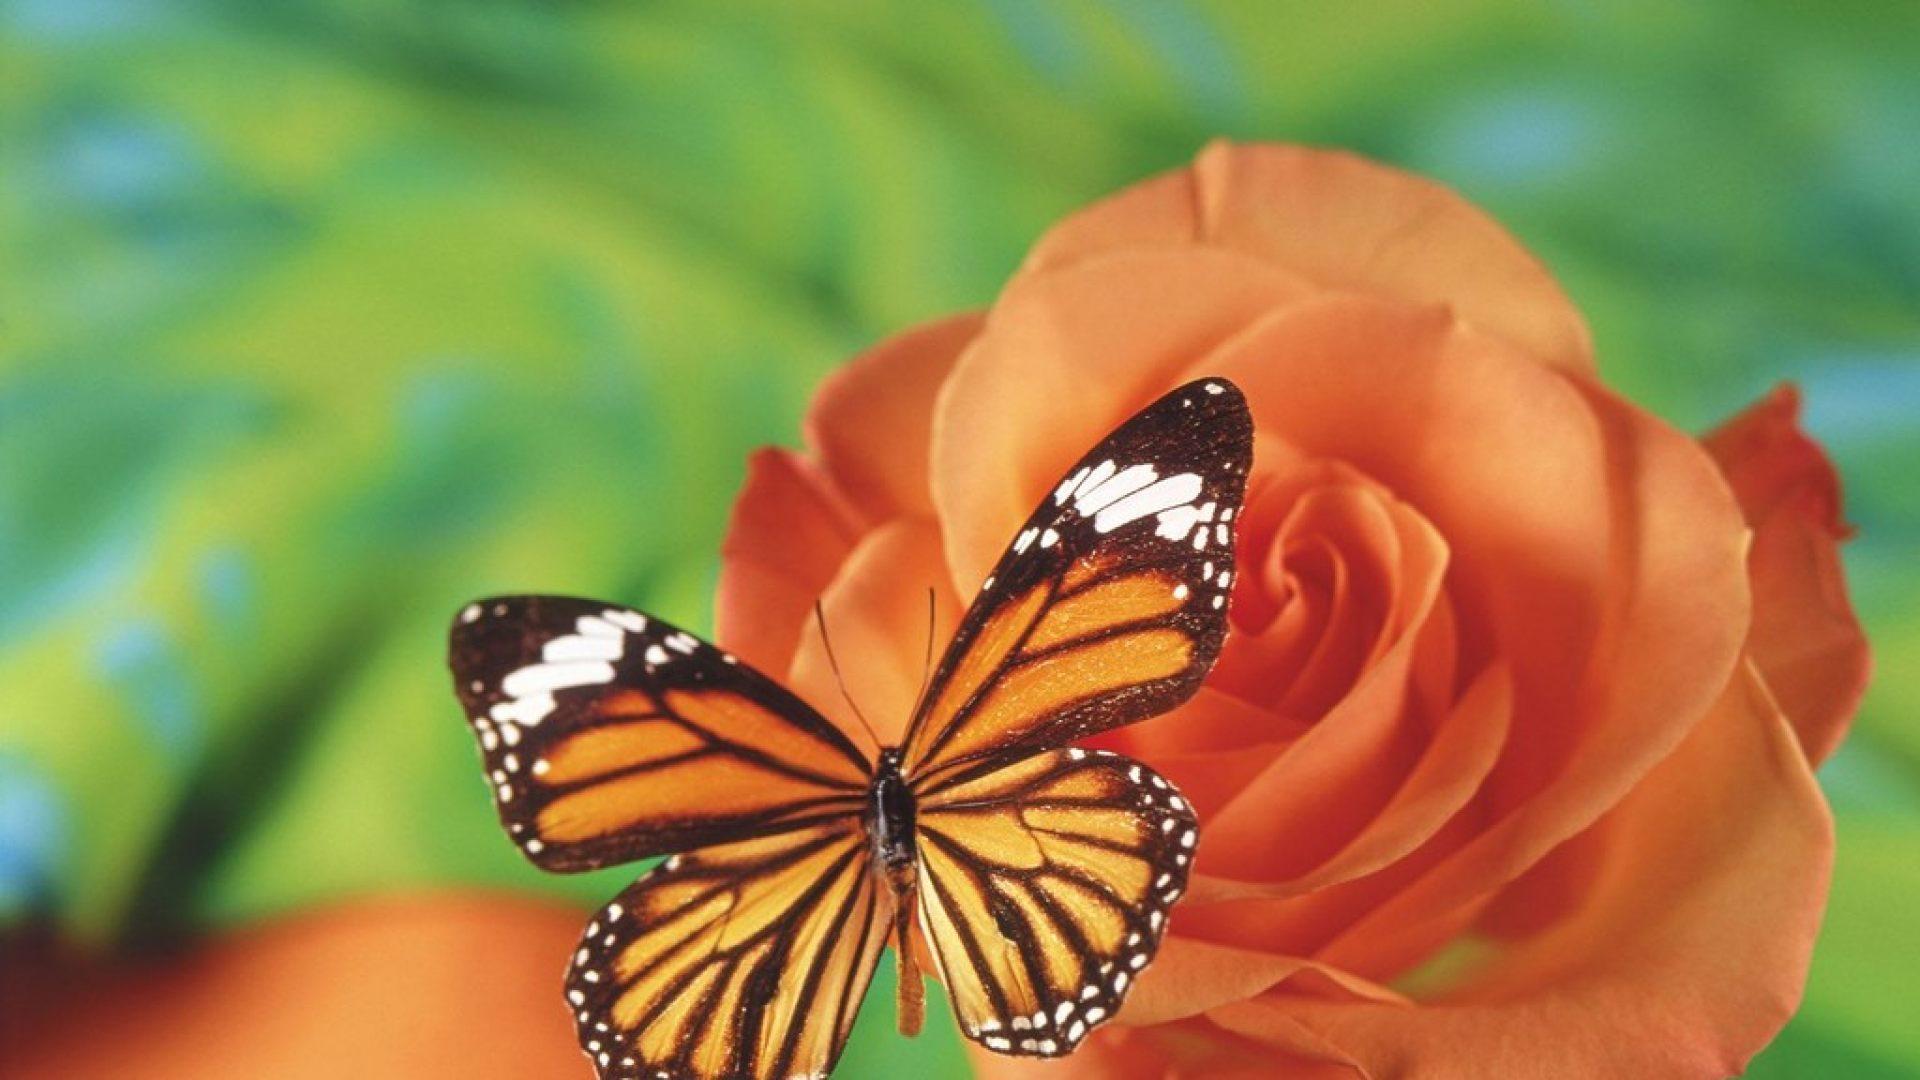 Fondo De Pantalla De Mariposas En Las Flores A 1440x900